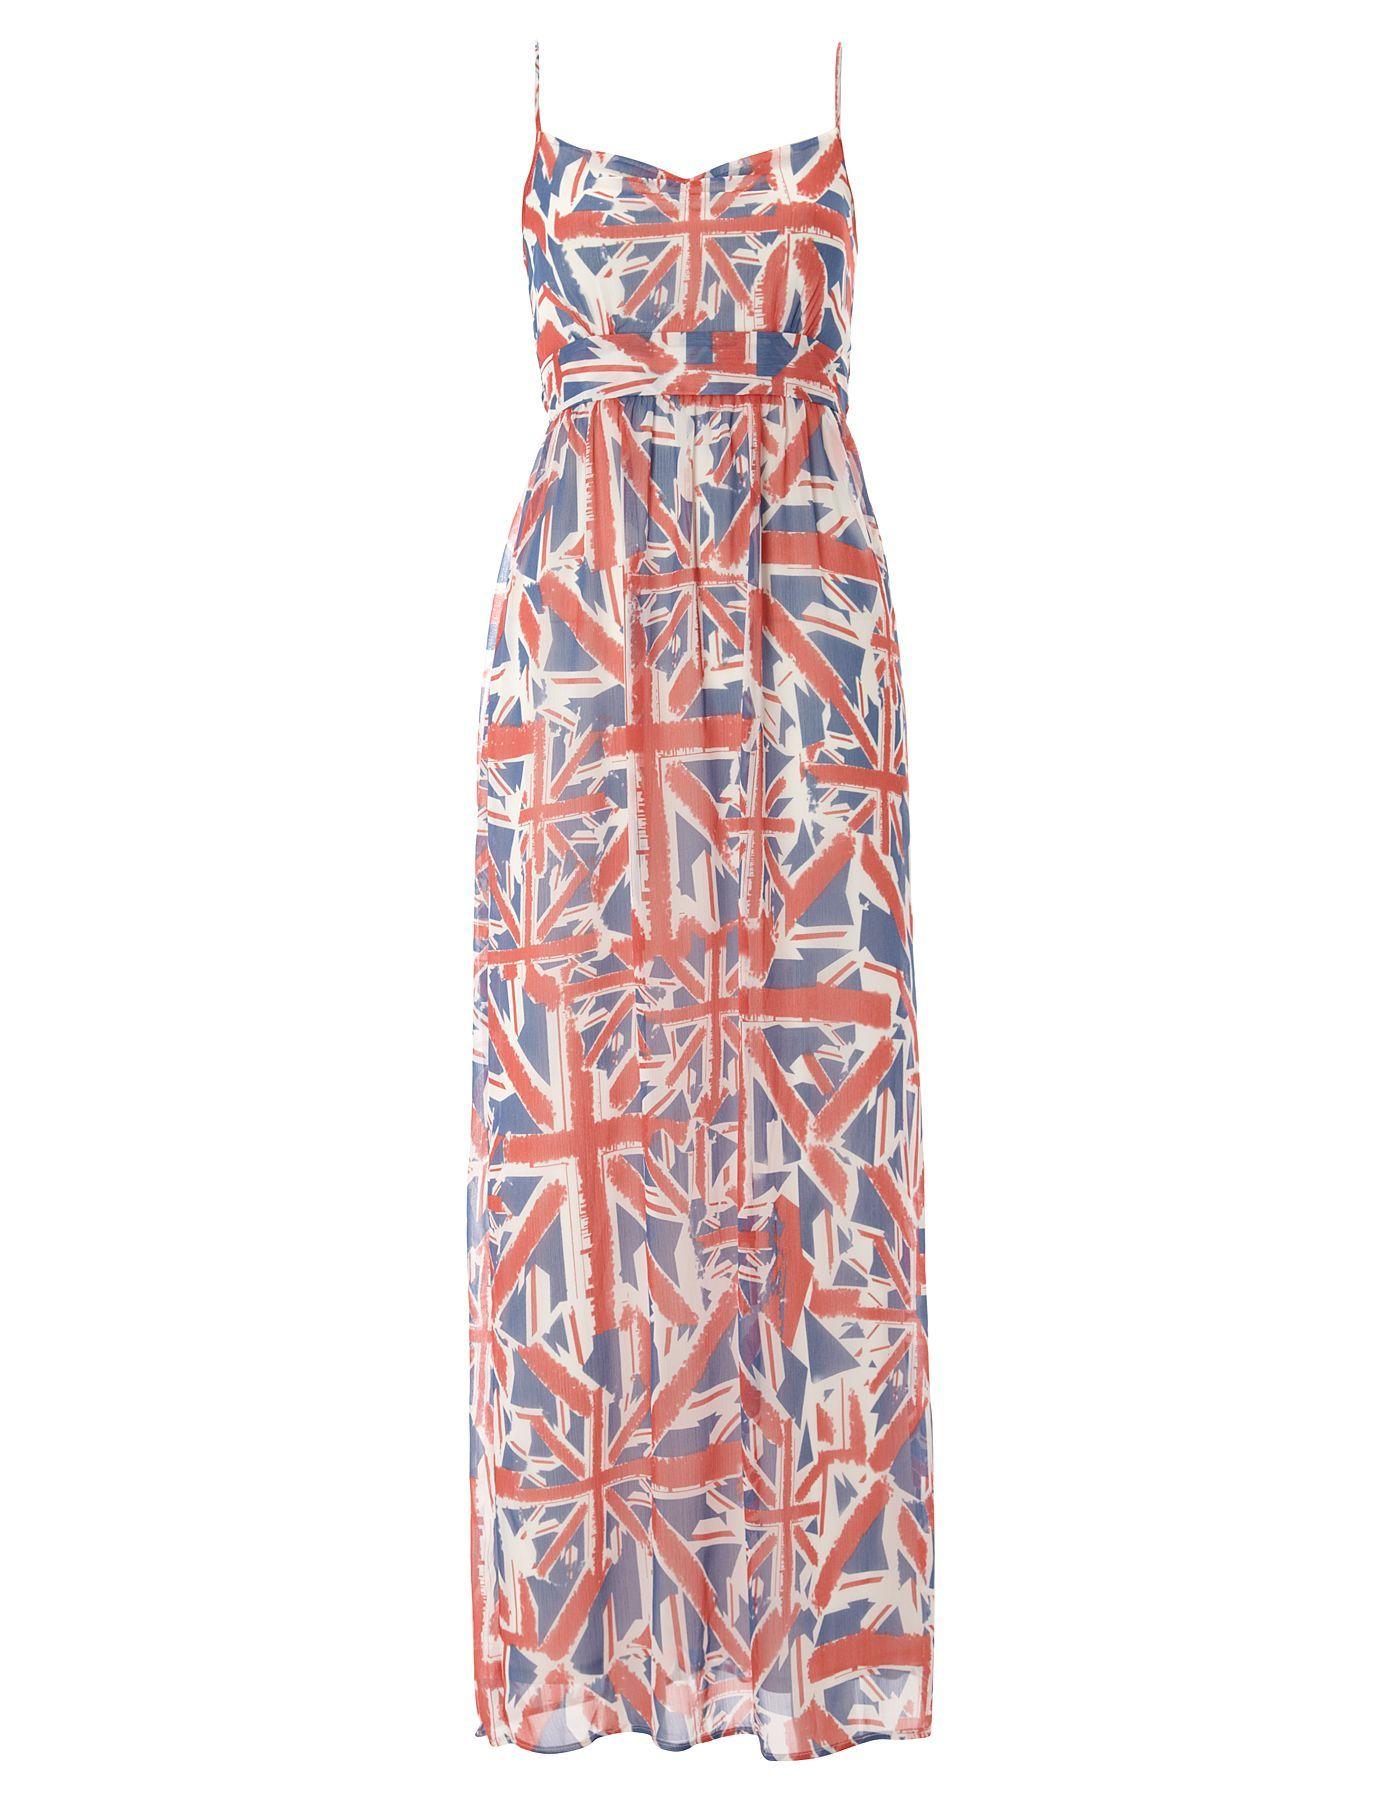 G21 Union Jack Print Dress | Women | George at ASDA | UK | Pinterest